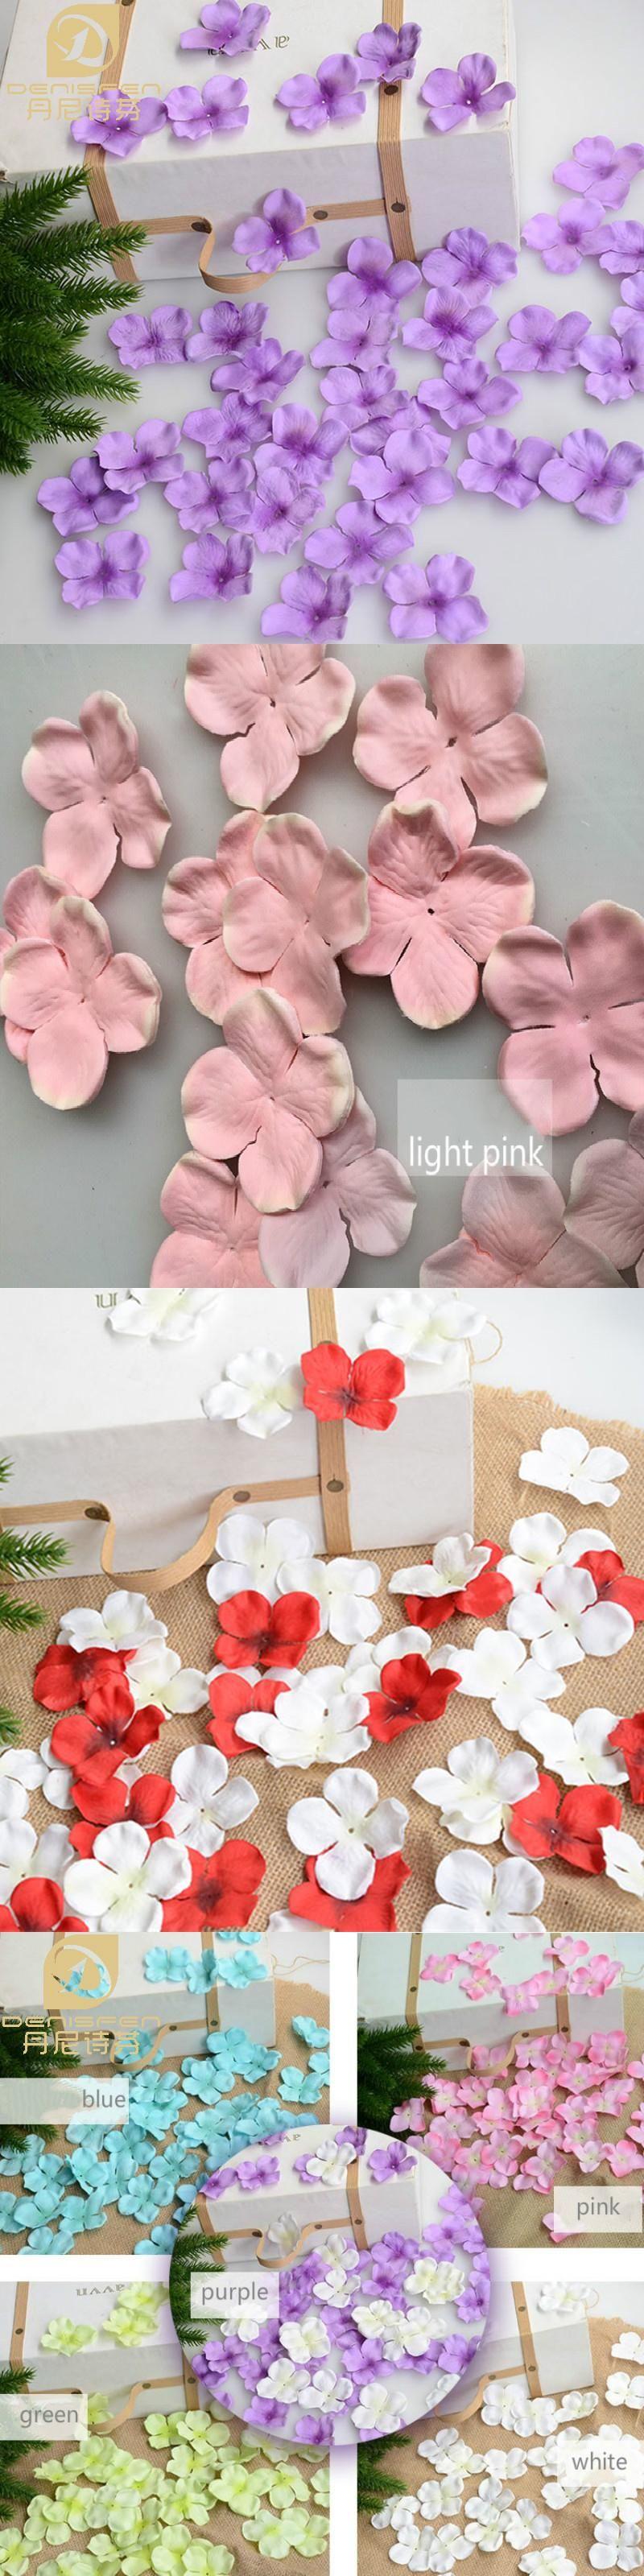 100g artificial hydrangea flower petals silk flower wedding 100g artificial hydrangea flower petals silk flower wedding decoration accessories supplies afp1453 free shipping mightylinksfo